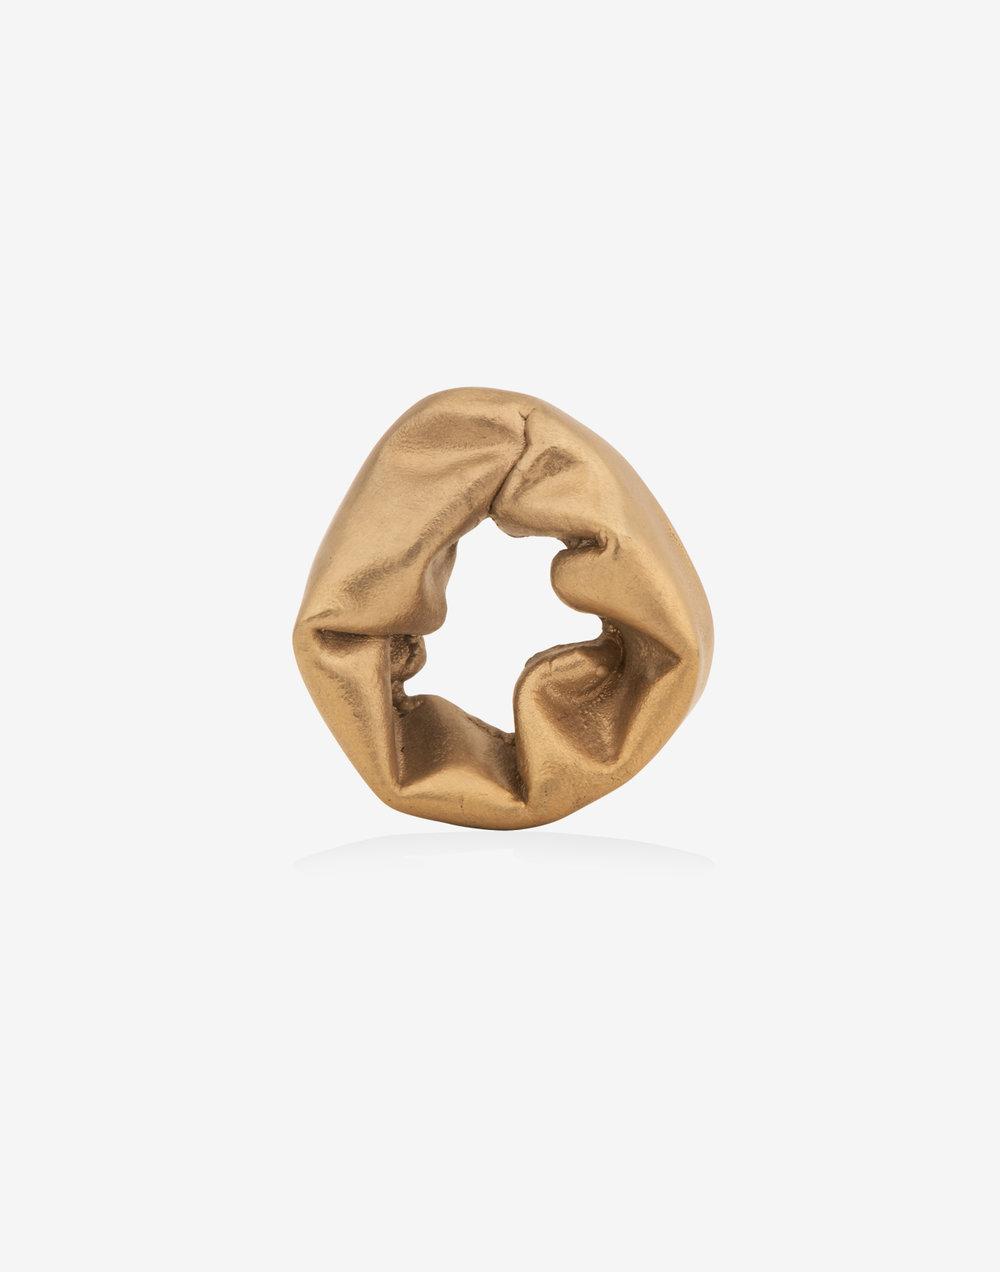 Completedworks-jewellery-R2020-Earring-Single-1-v1.jpg